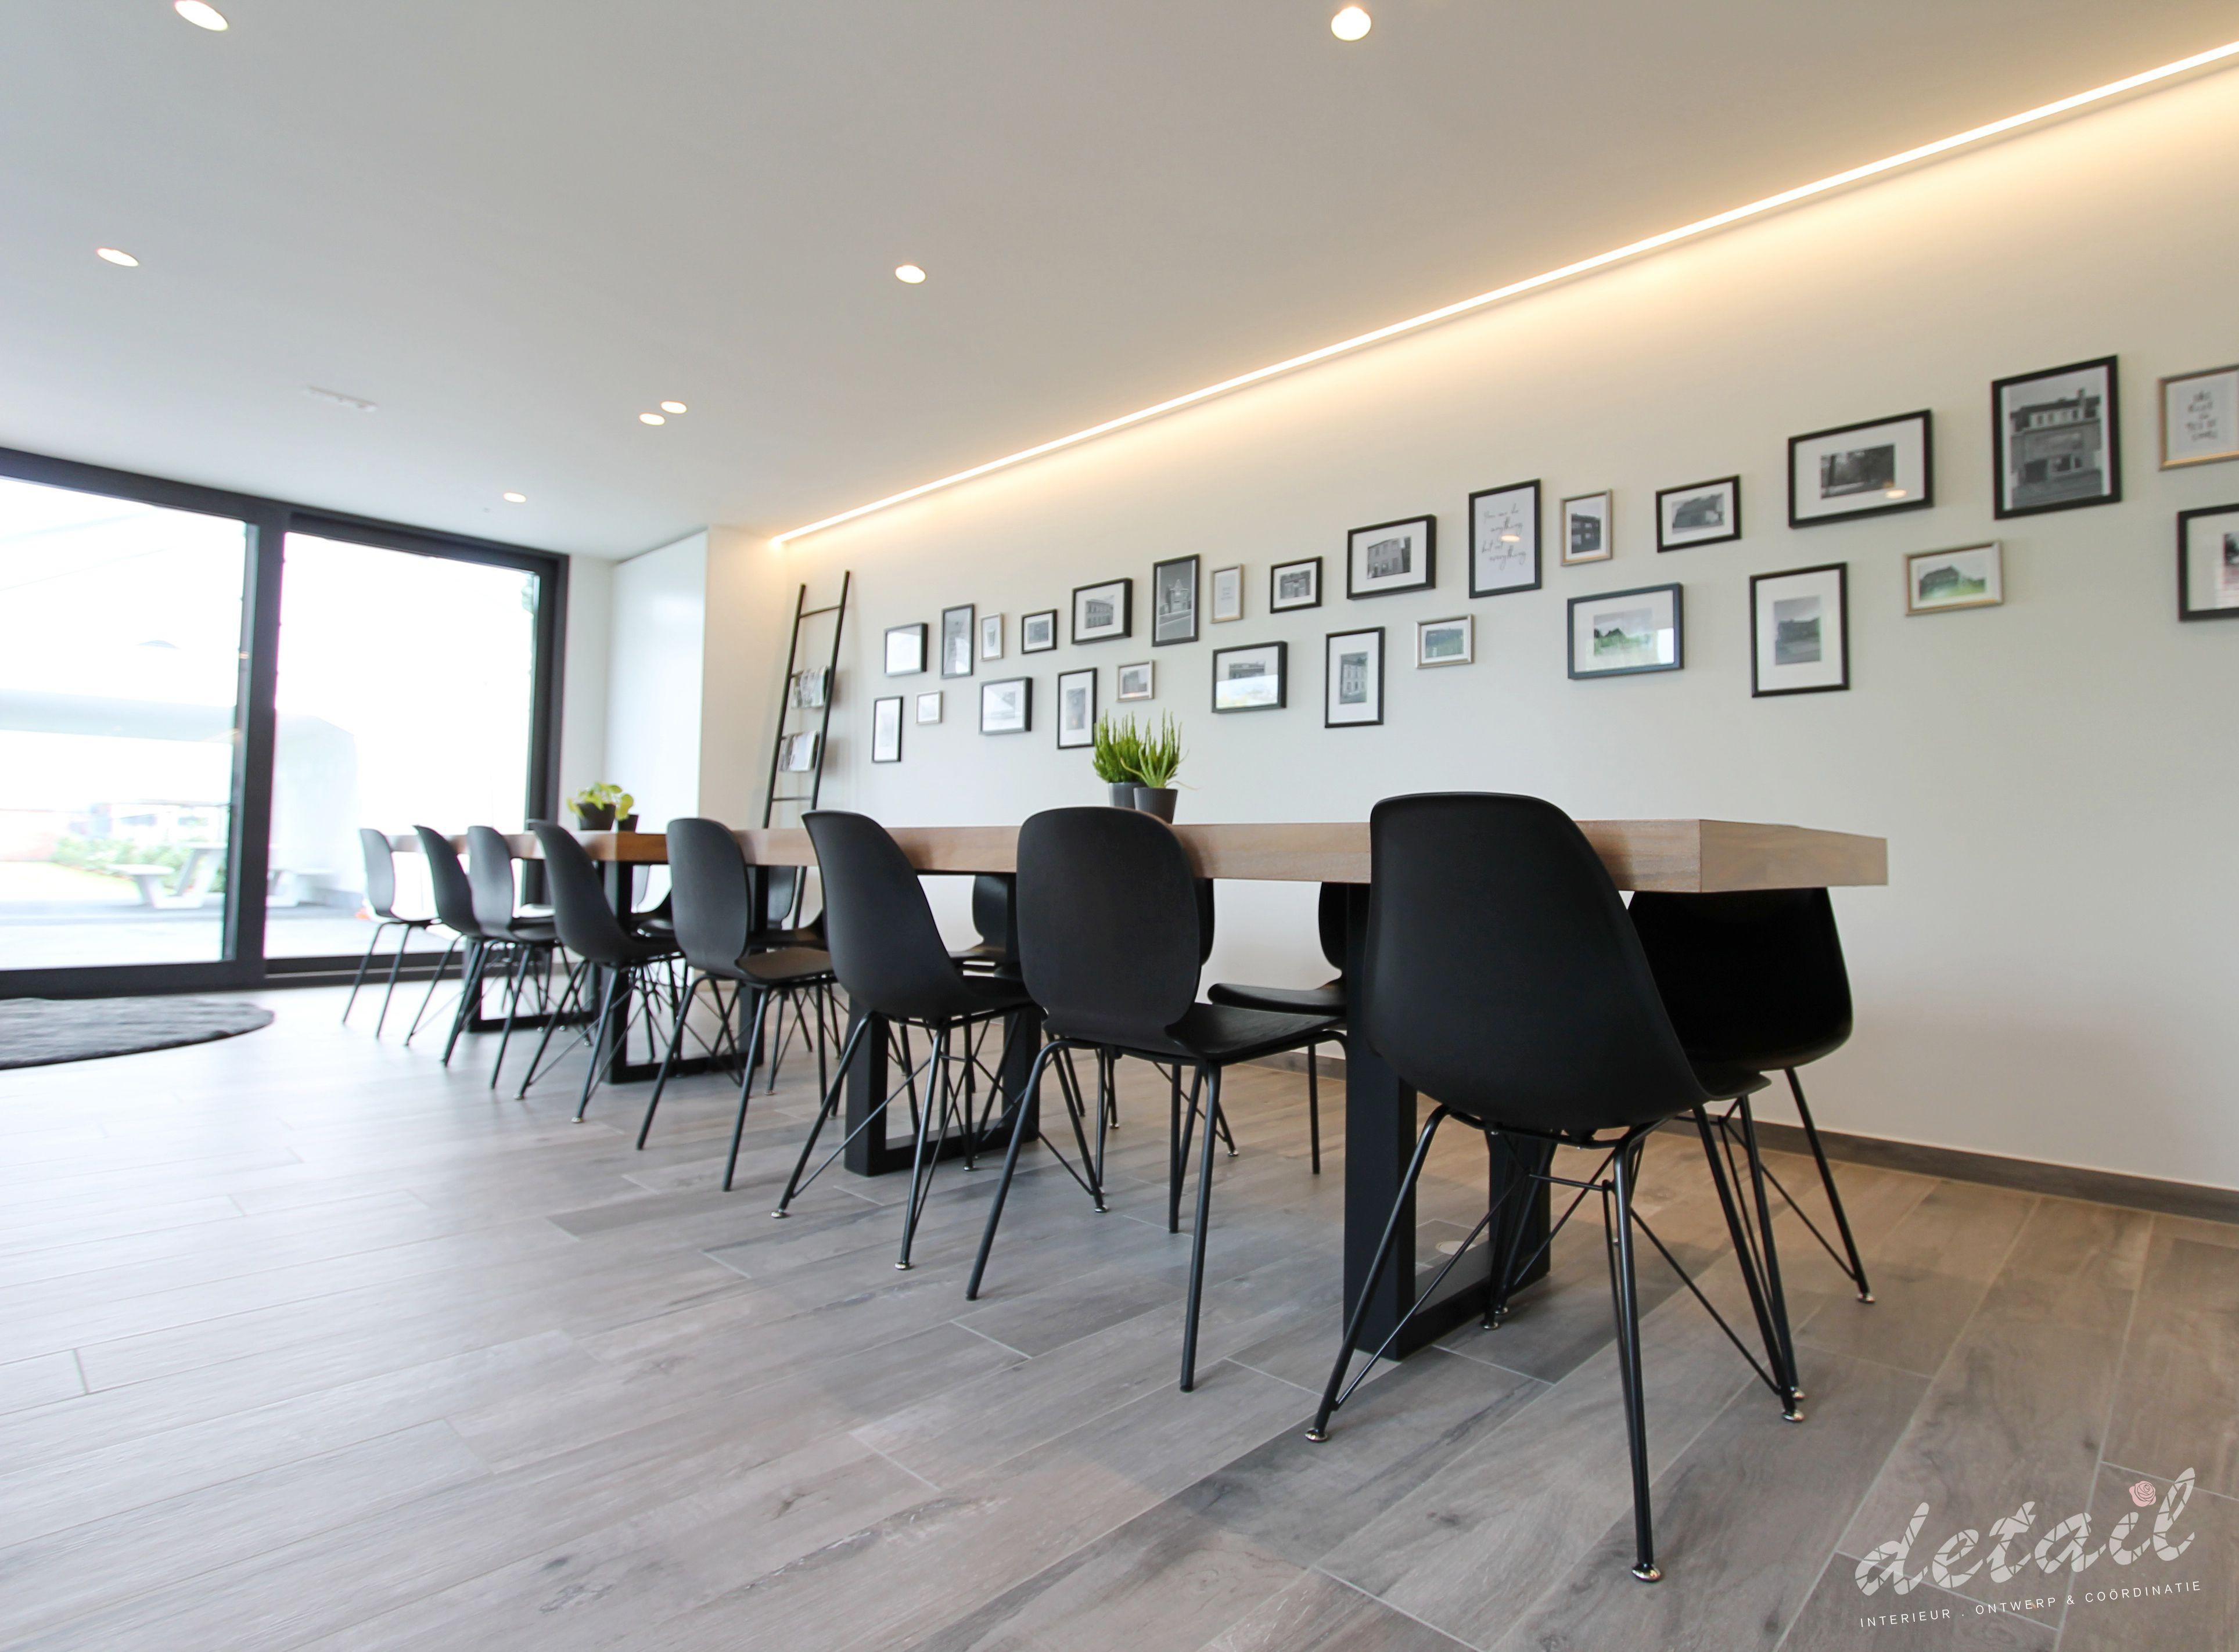 Modern interieur houtsnijwerk: modern bohemian bedroom decorating